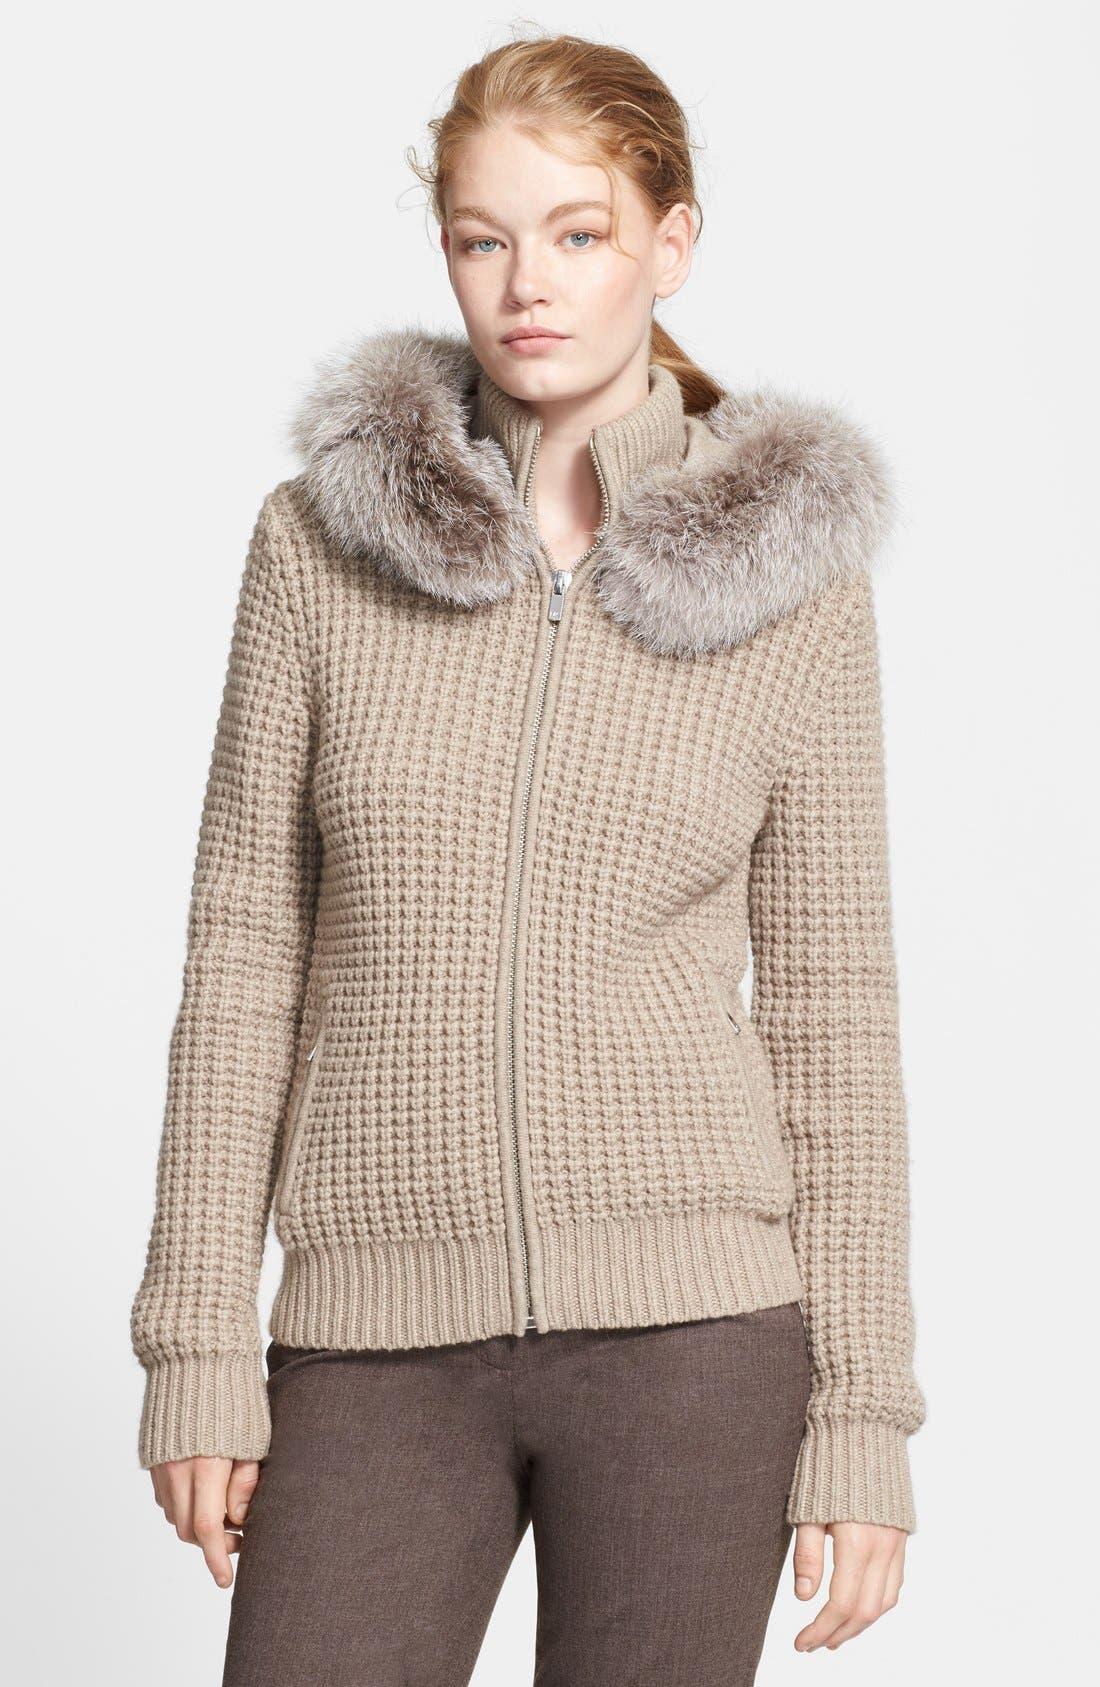 Alternate Image 1 Selected - Michael Kors Zip Front Cashmere Hoodie with Genuine Fox Fur Trim